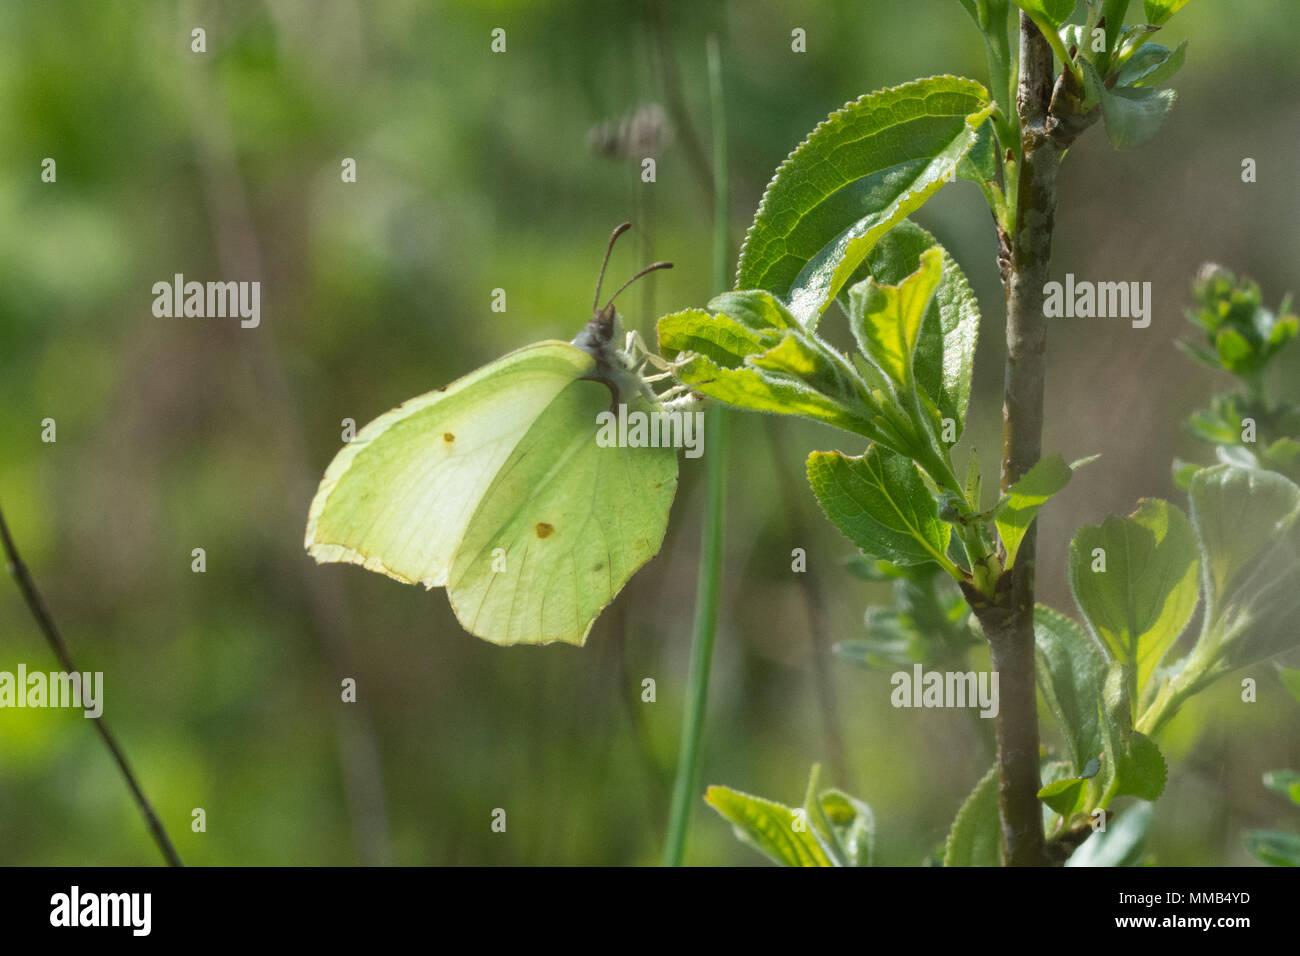 Zitronenfalter (Gonepteryx rhamni) ovipositing (Eier), Faulbaum (FRANGULA ALNUS) in Hampshire, Großbritannien Stockbild